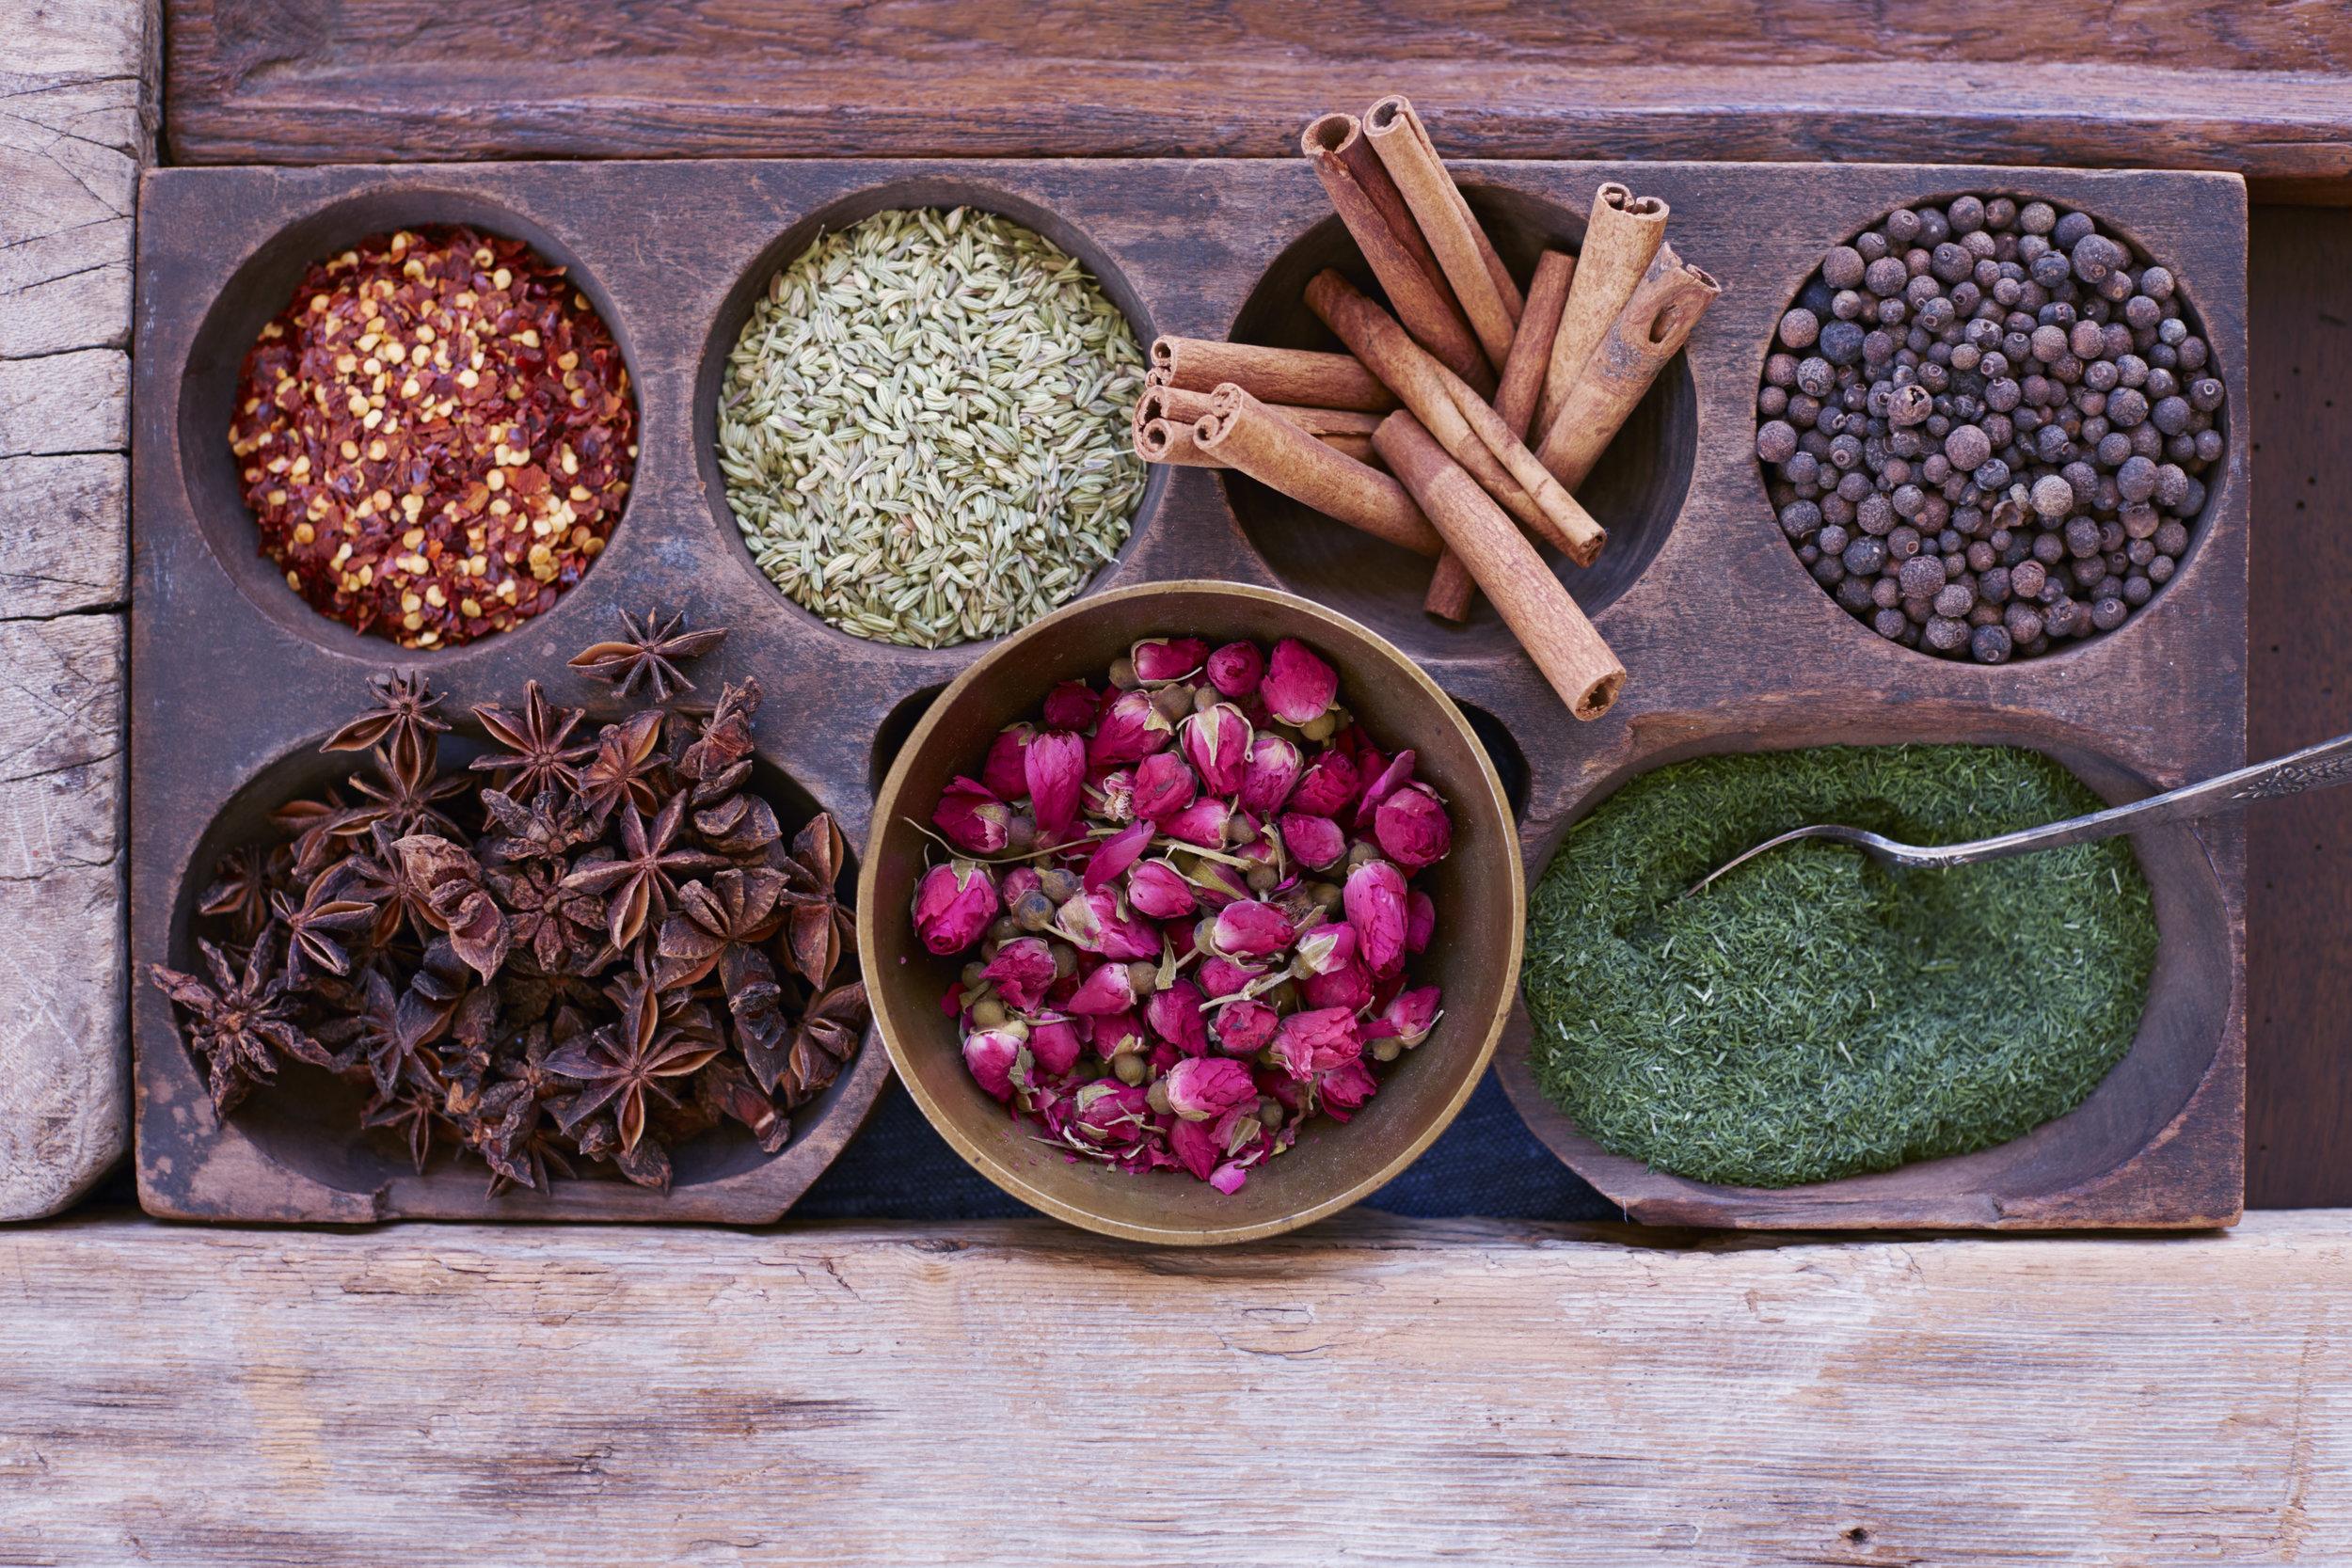 Mira_Zaki_spices_wood.jpg